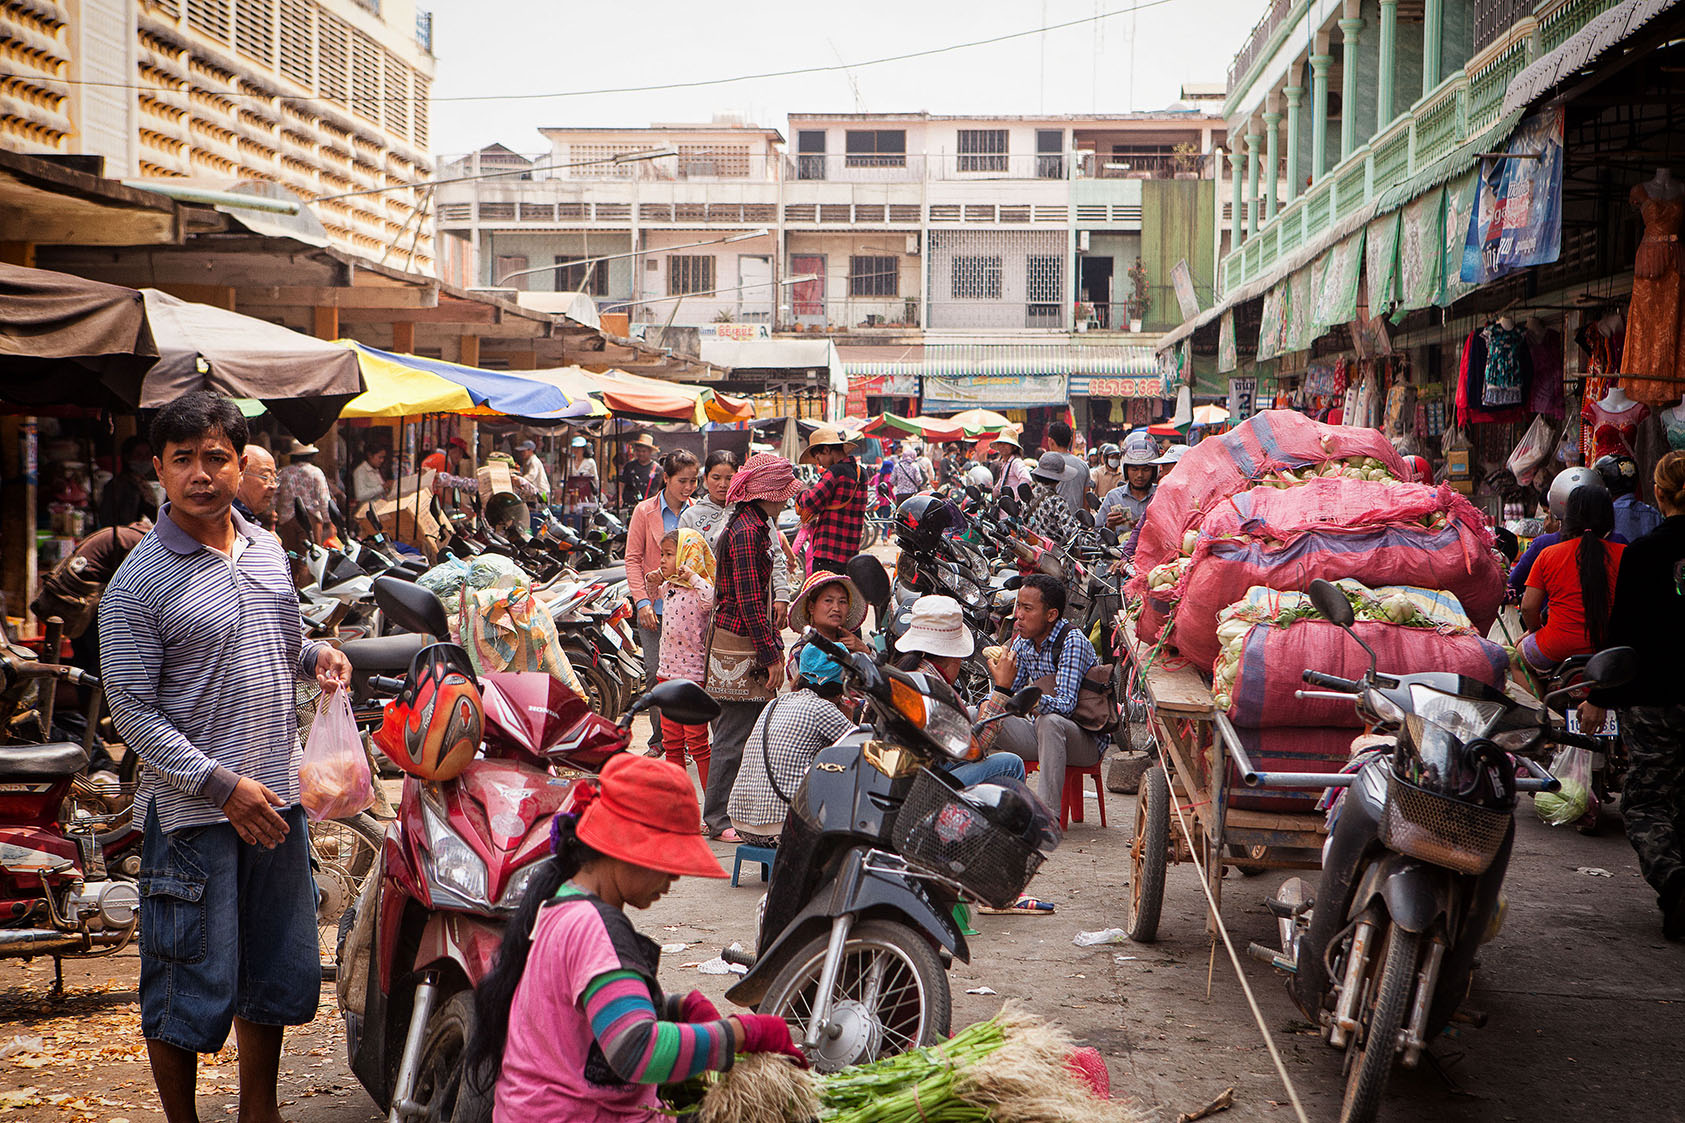 Motopeds_Cambodia-22.jpg